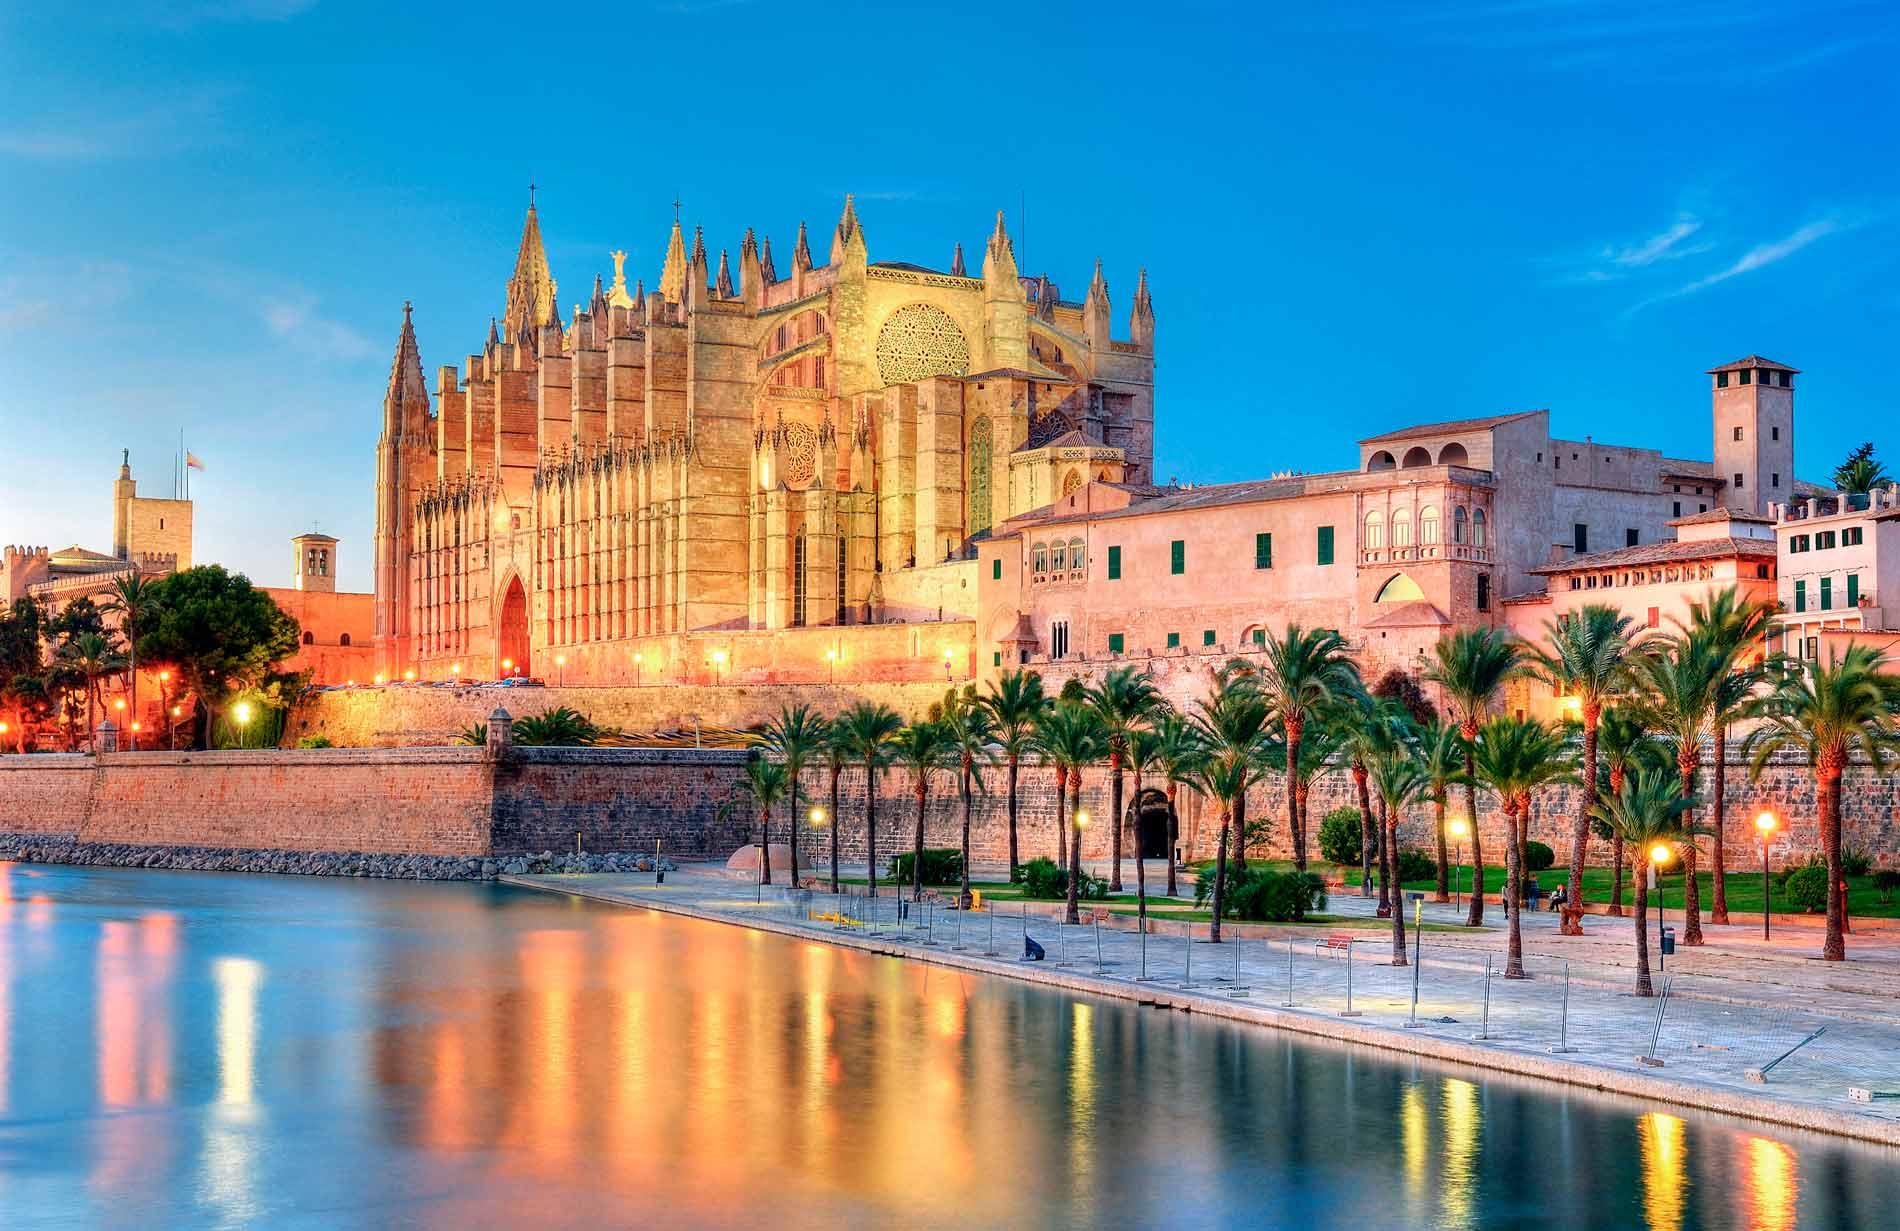 **Kurztrip nach Mallorca** 5 Tage im 4* Hotel inkl. Frühstück + Flug + Transfer + Zug zum Flug für 199 € p.P.